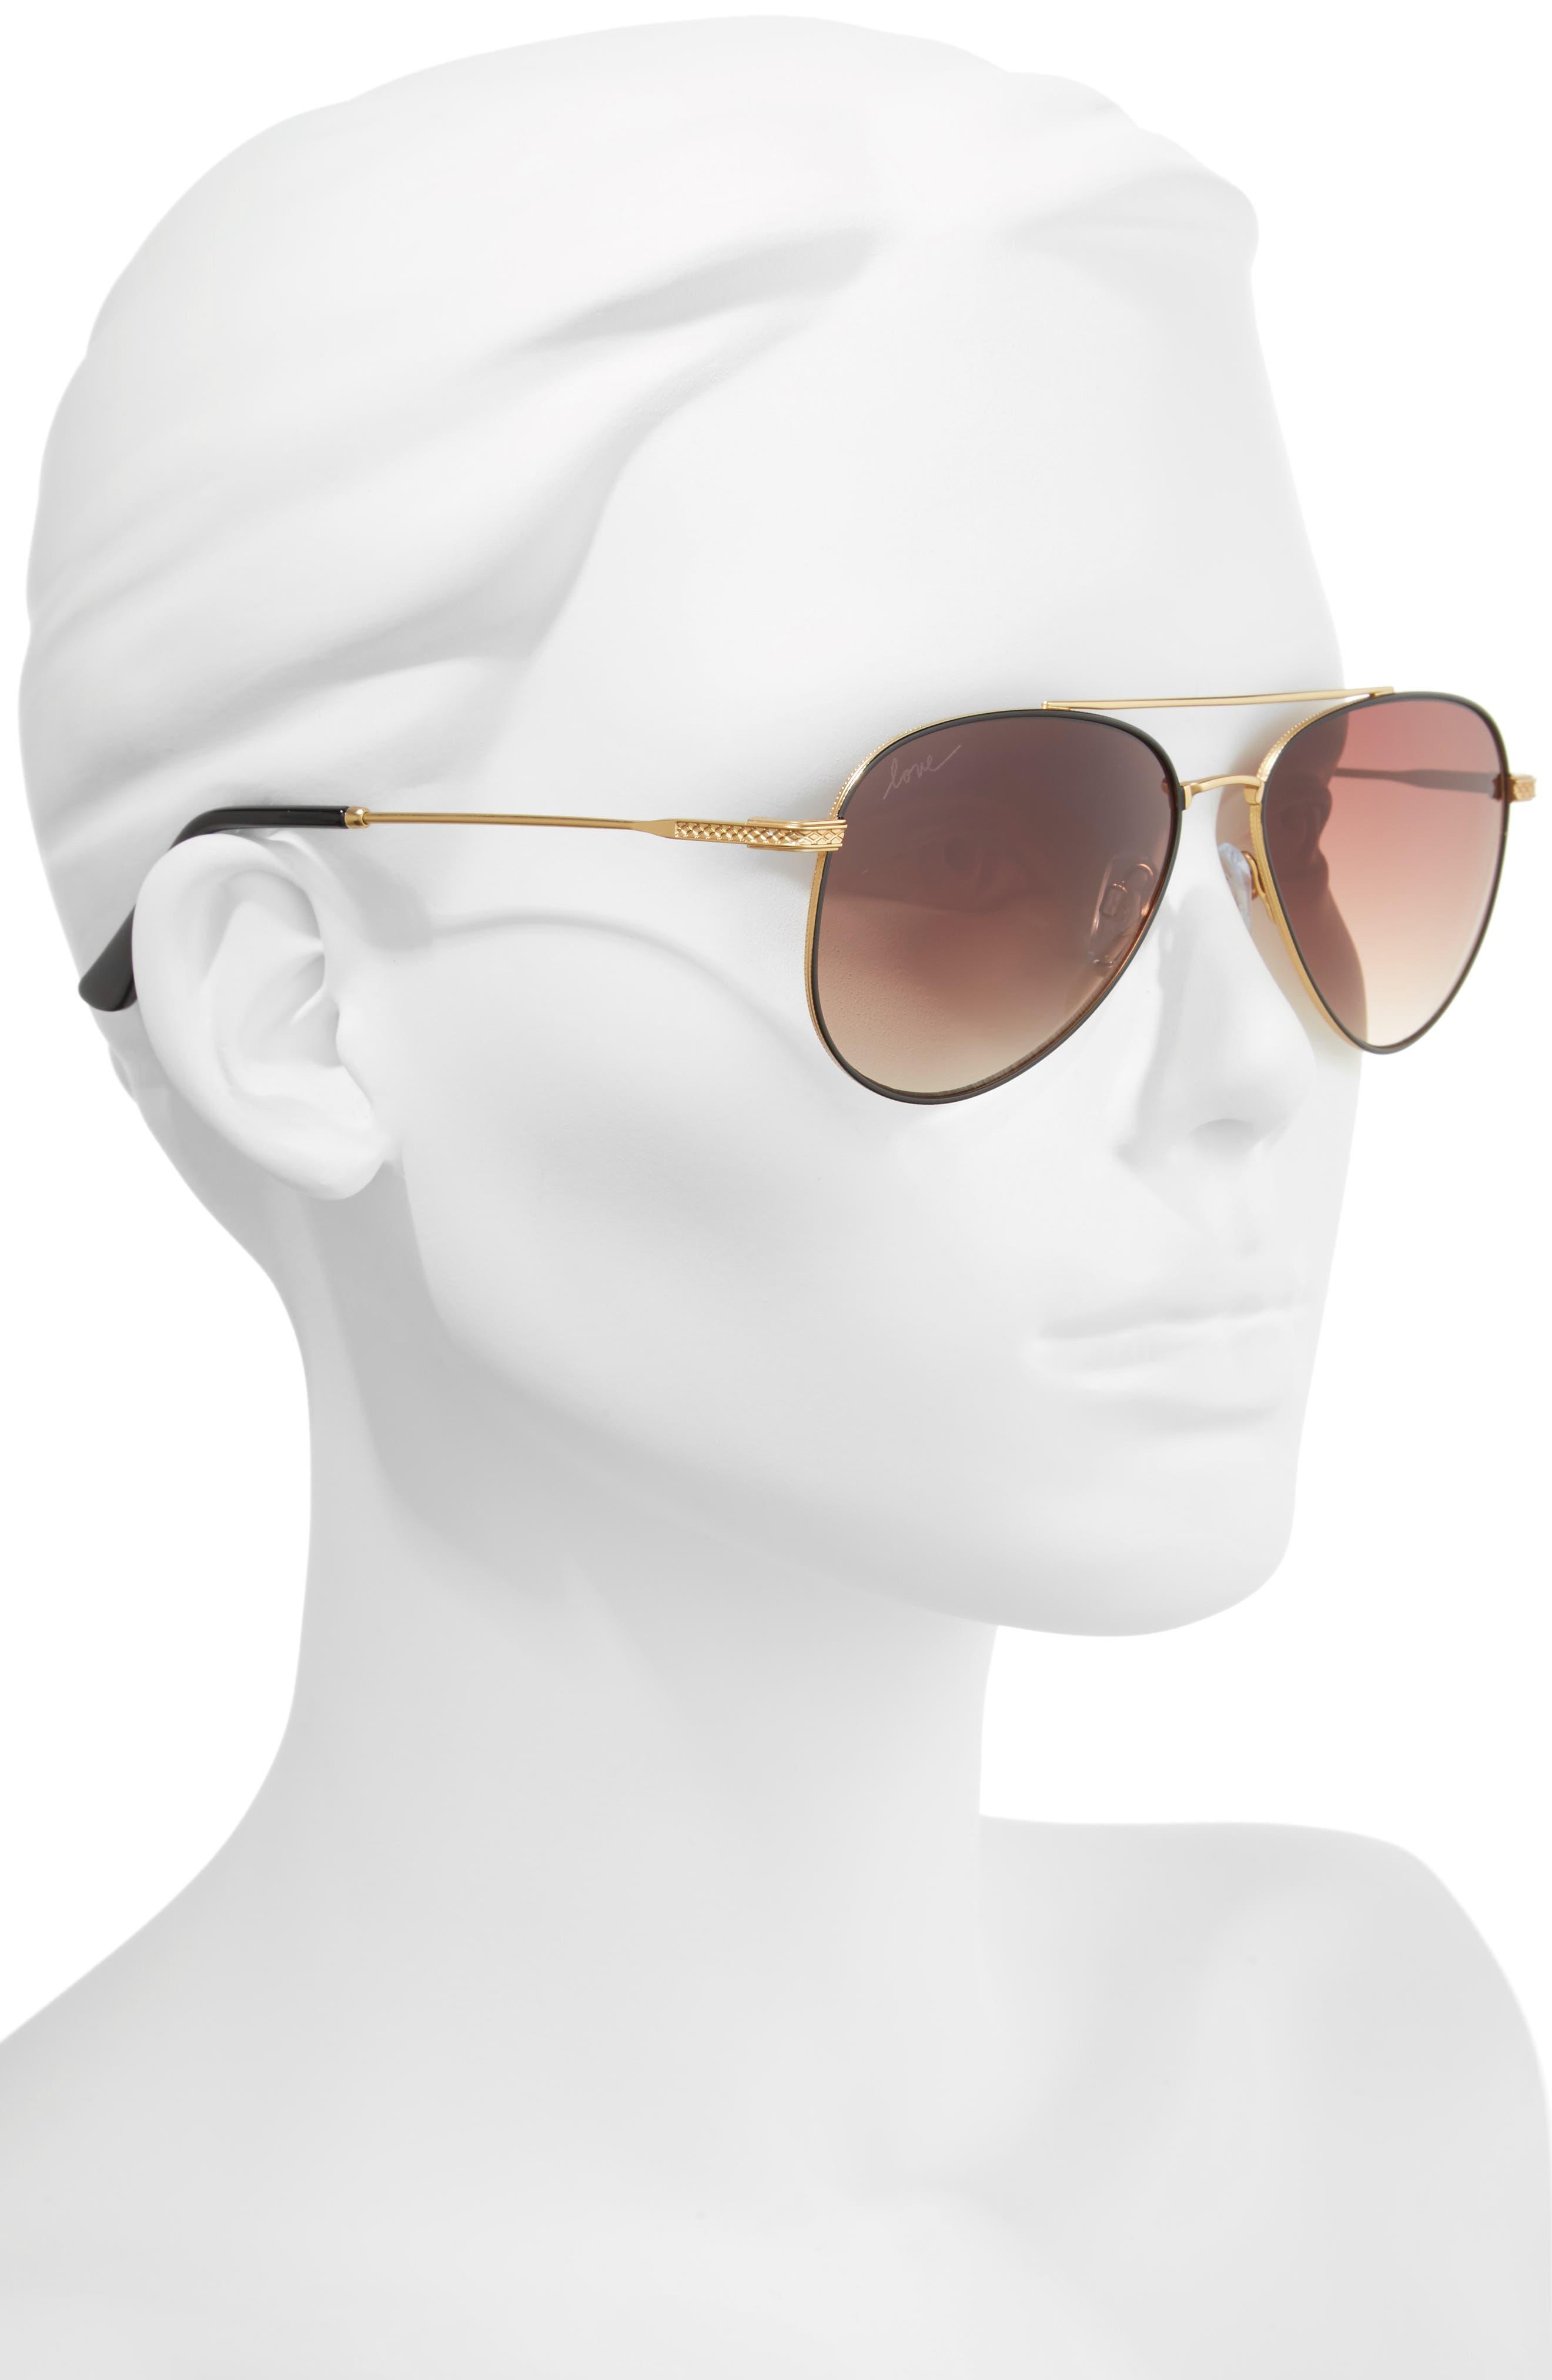 58mm Aviator Sunglasses,                             Alternate thumbnail 6, color,